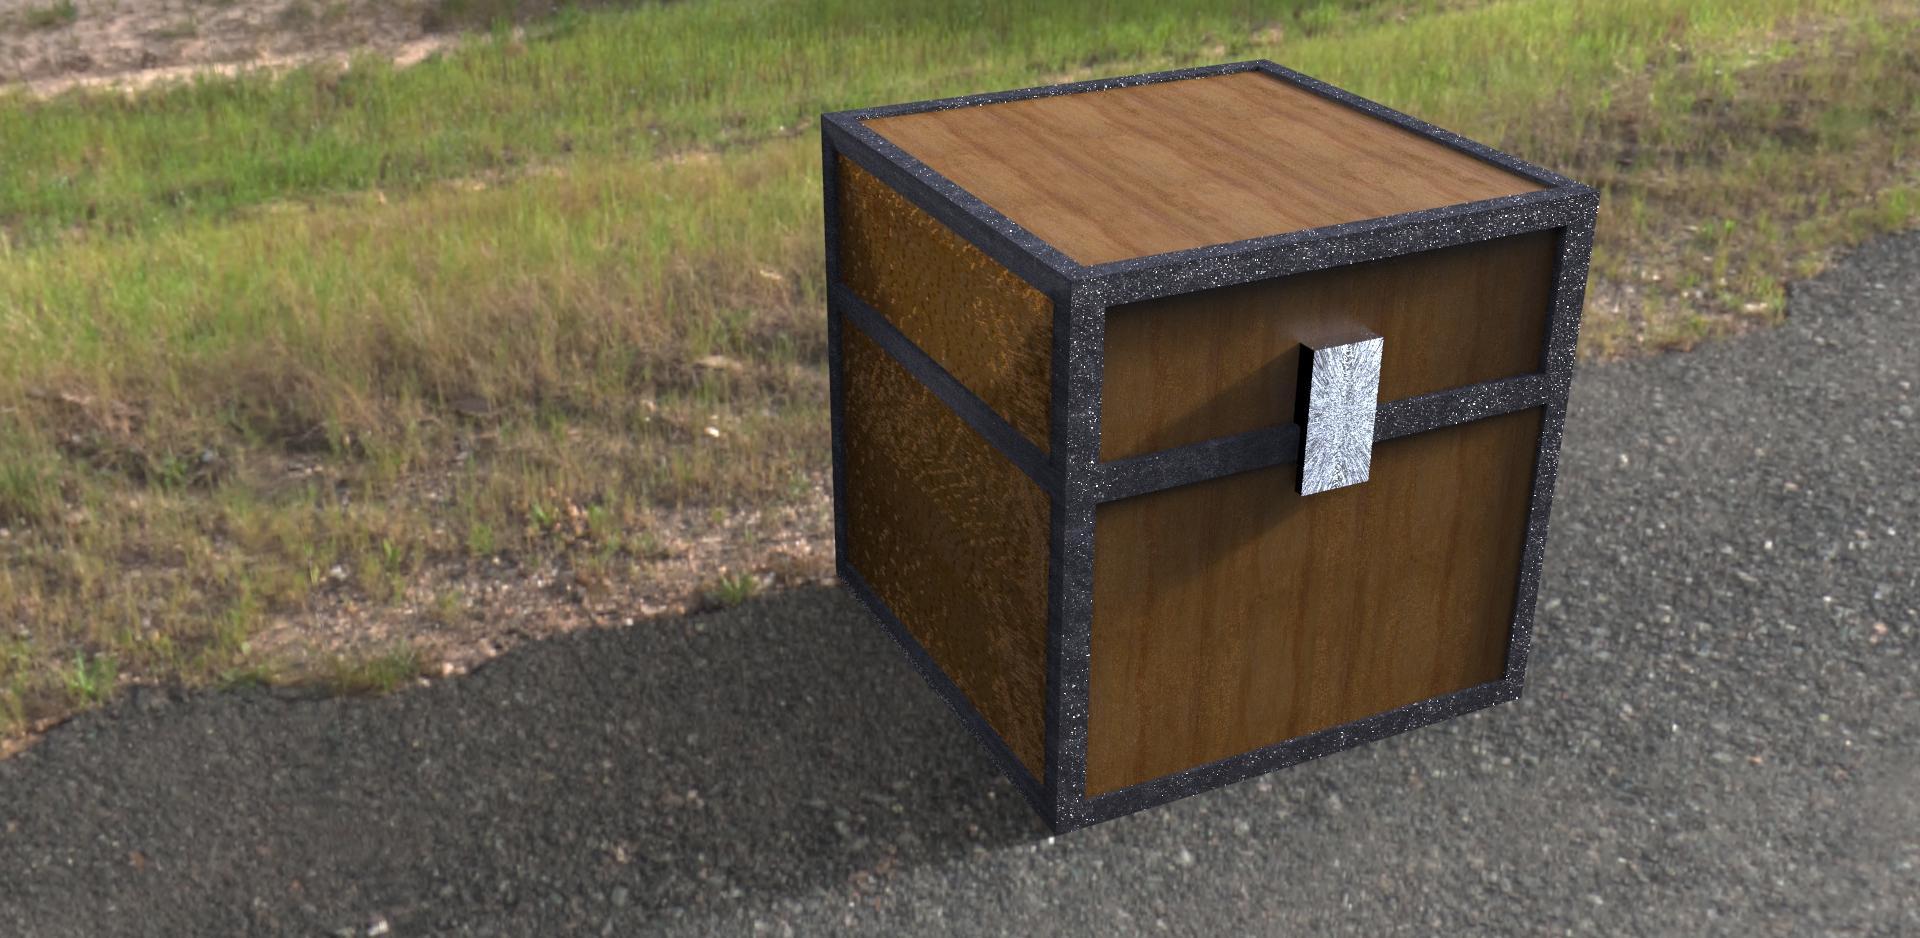 real minecraft chest by Bull3tModz on DeviantArt